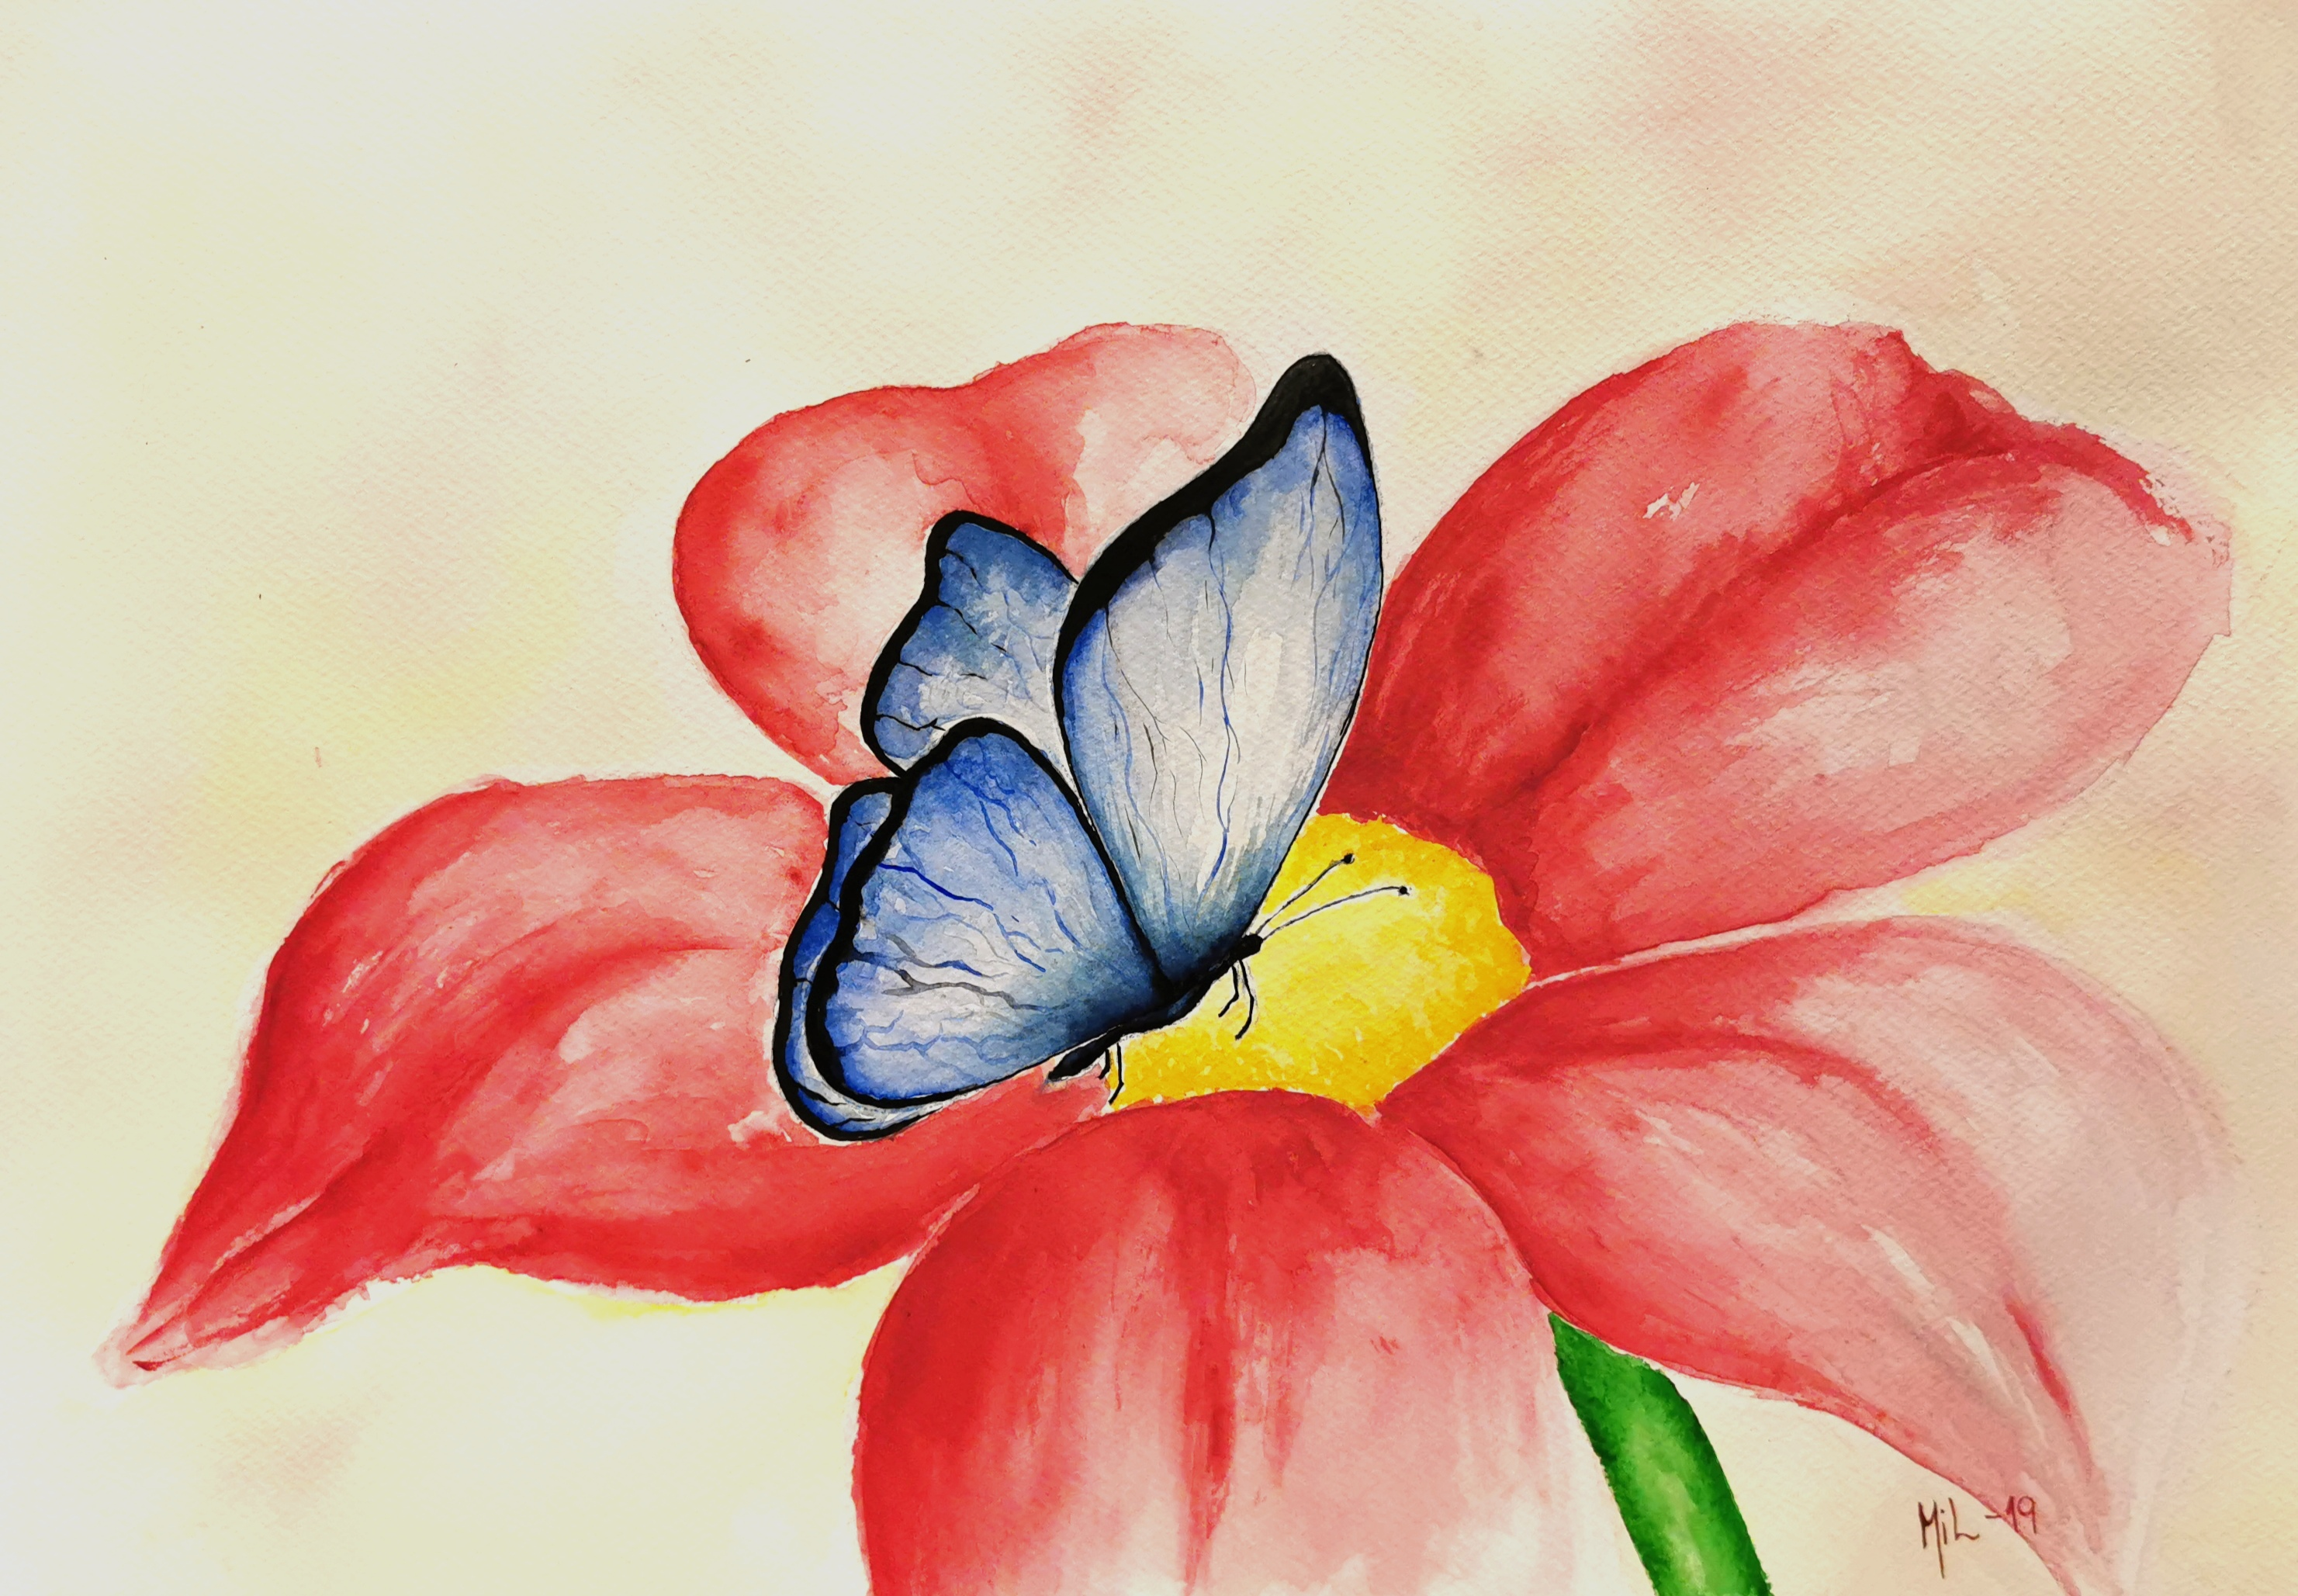 Sommarfugl på blome